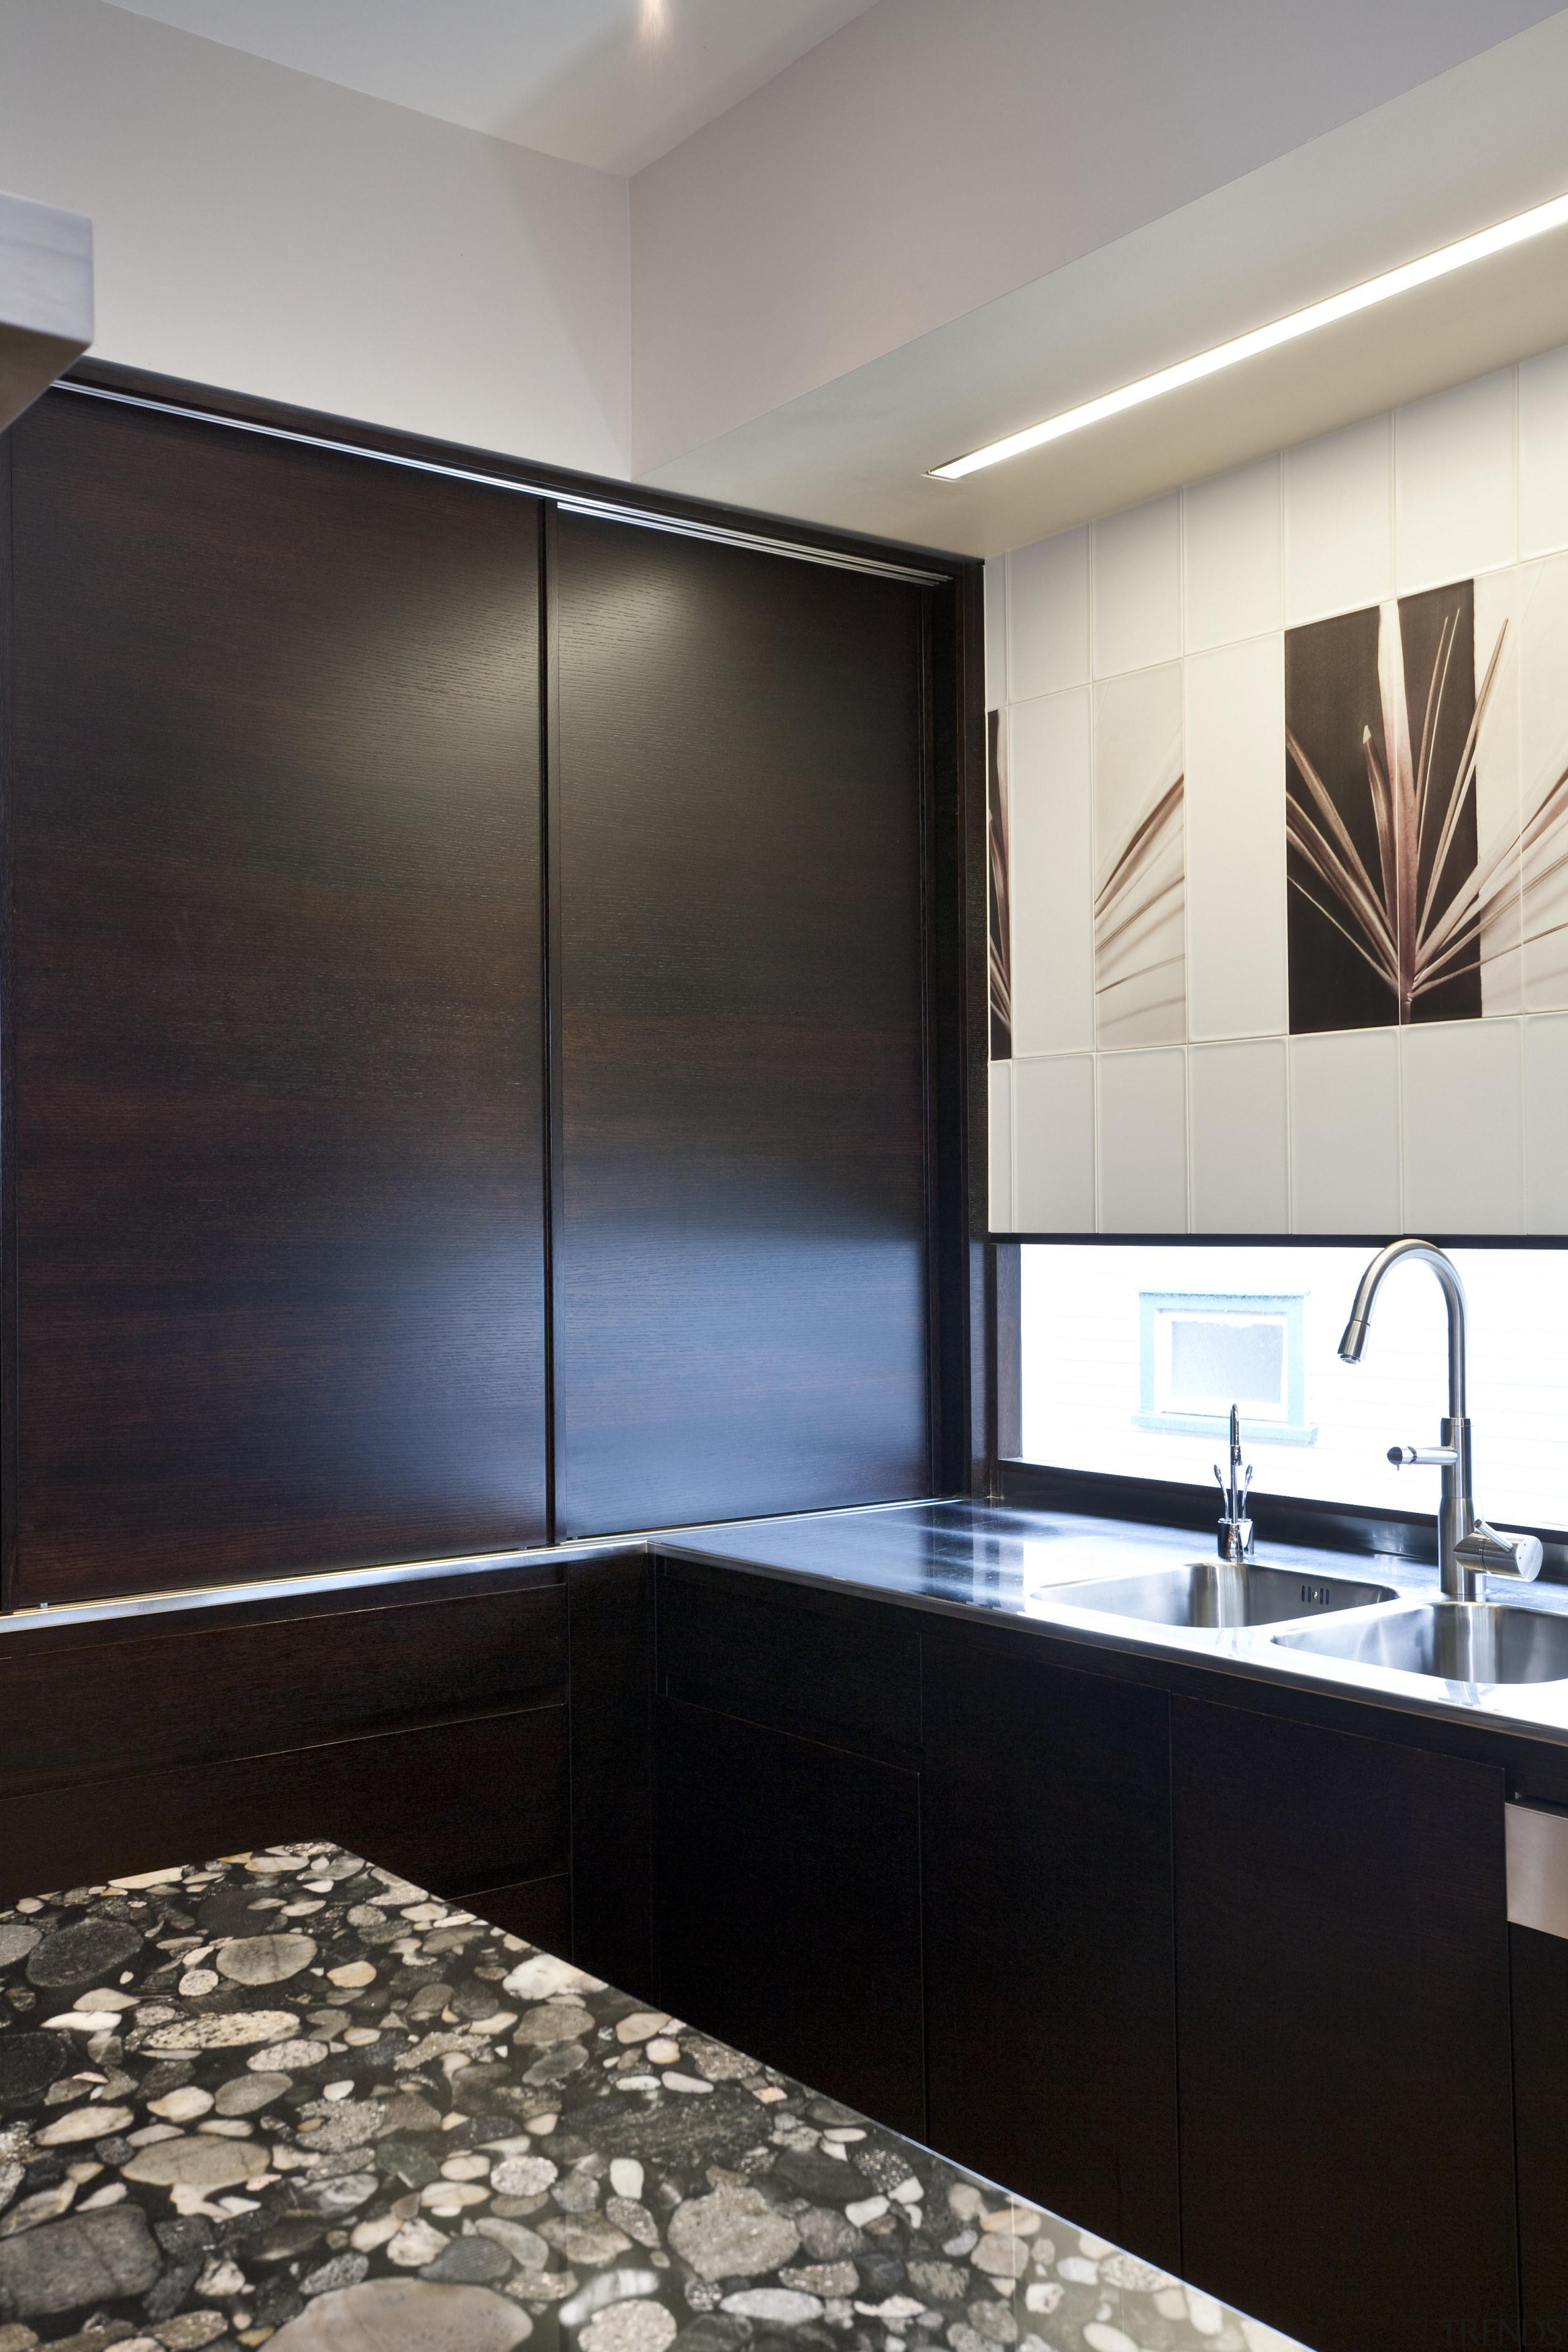 So this area looks good even when the bathroom, ceiling, countertop, floor, flooring, glass, interior design, room, sink, black, gray